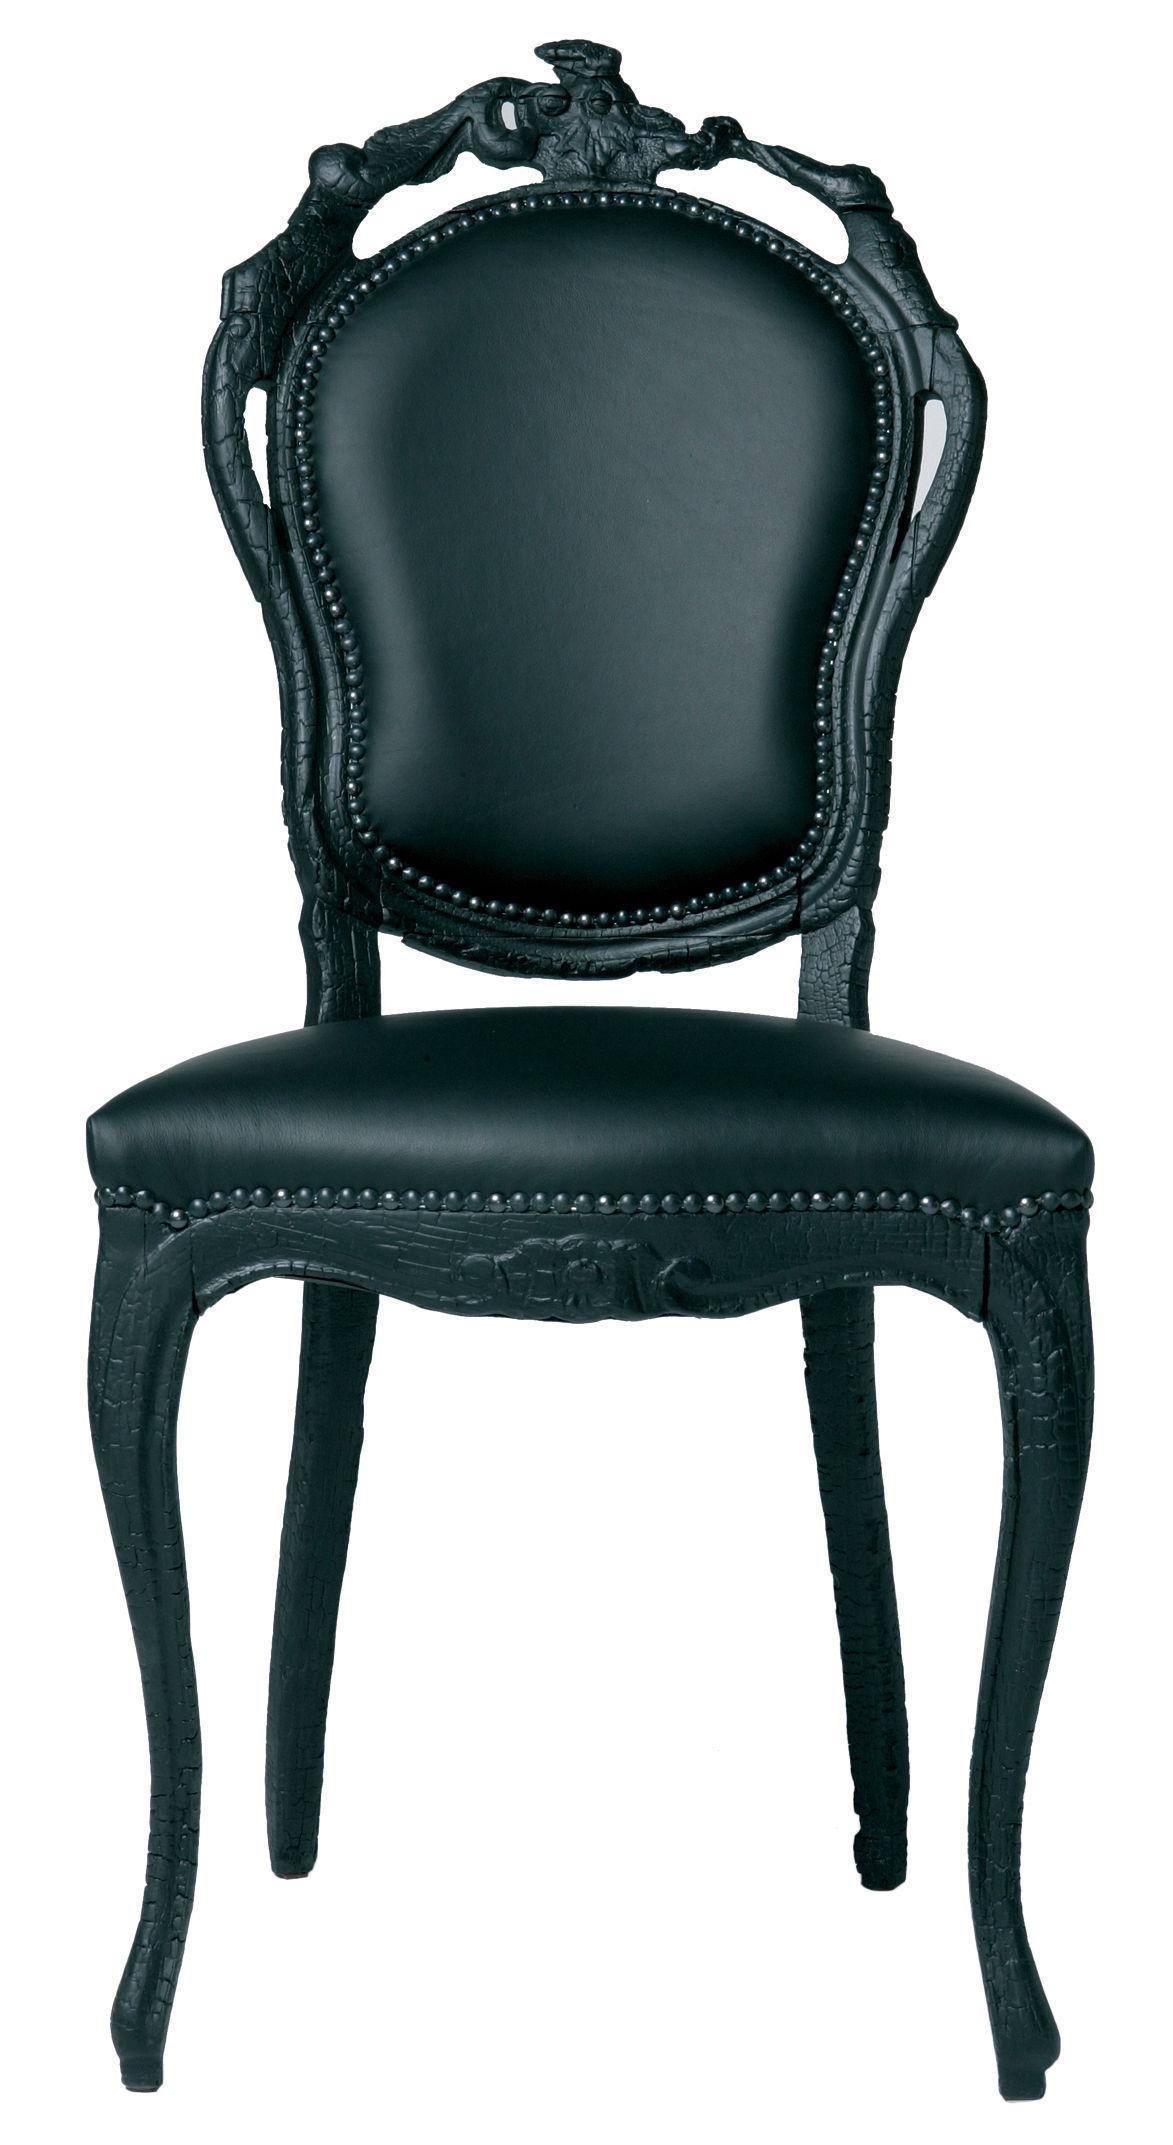 Chaise Rembourre Smoke Chair Bois Cuir Noir